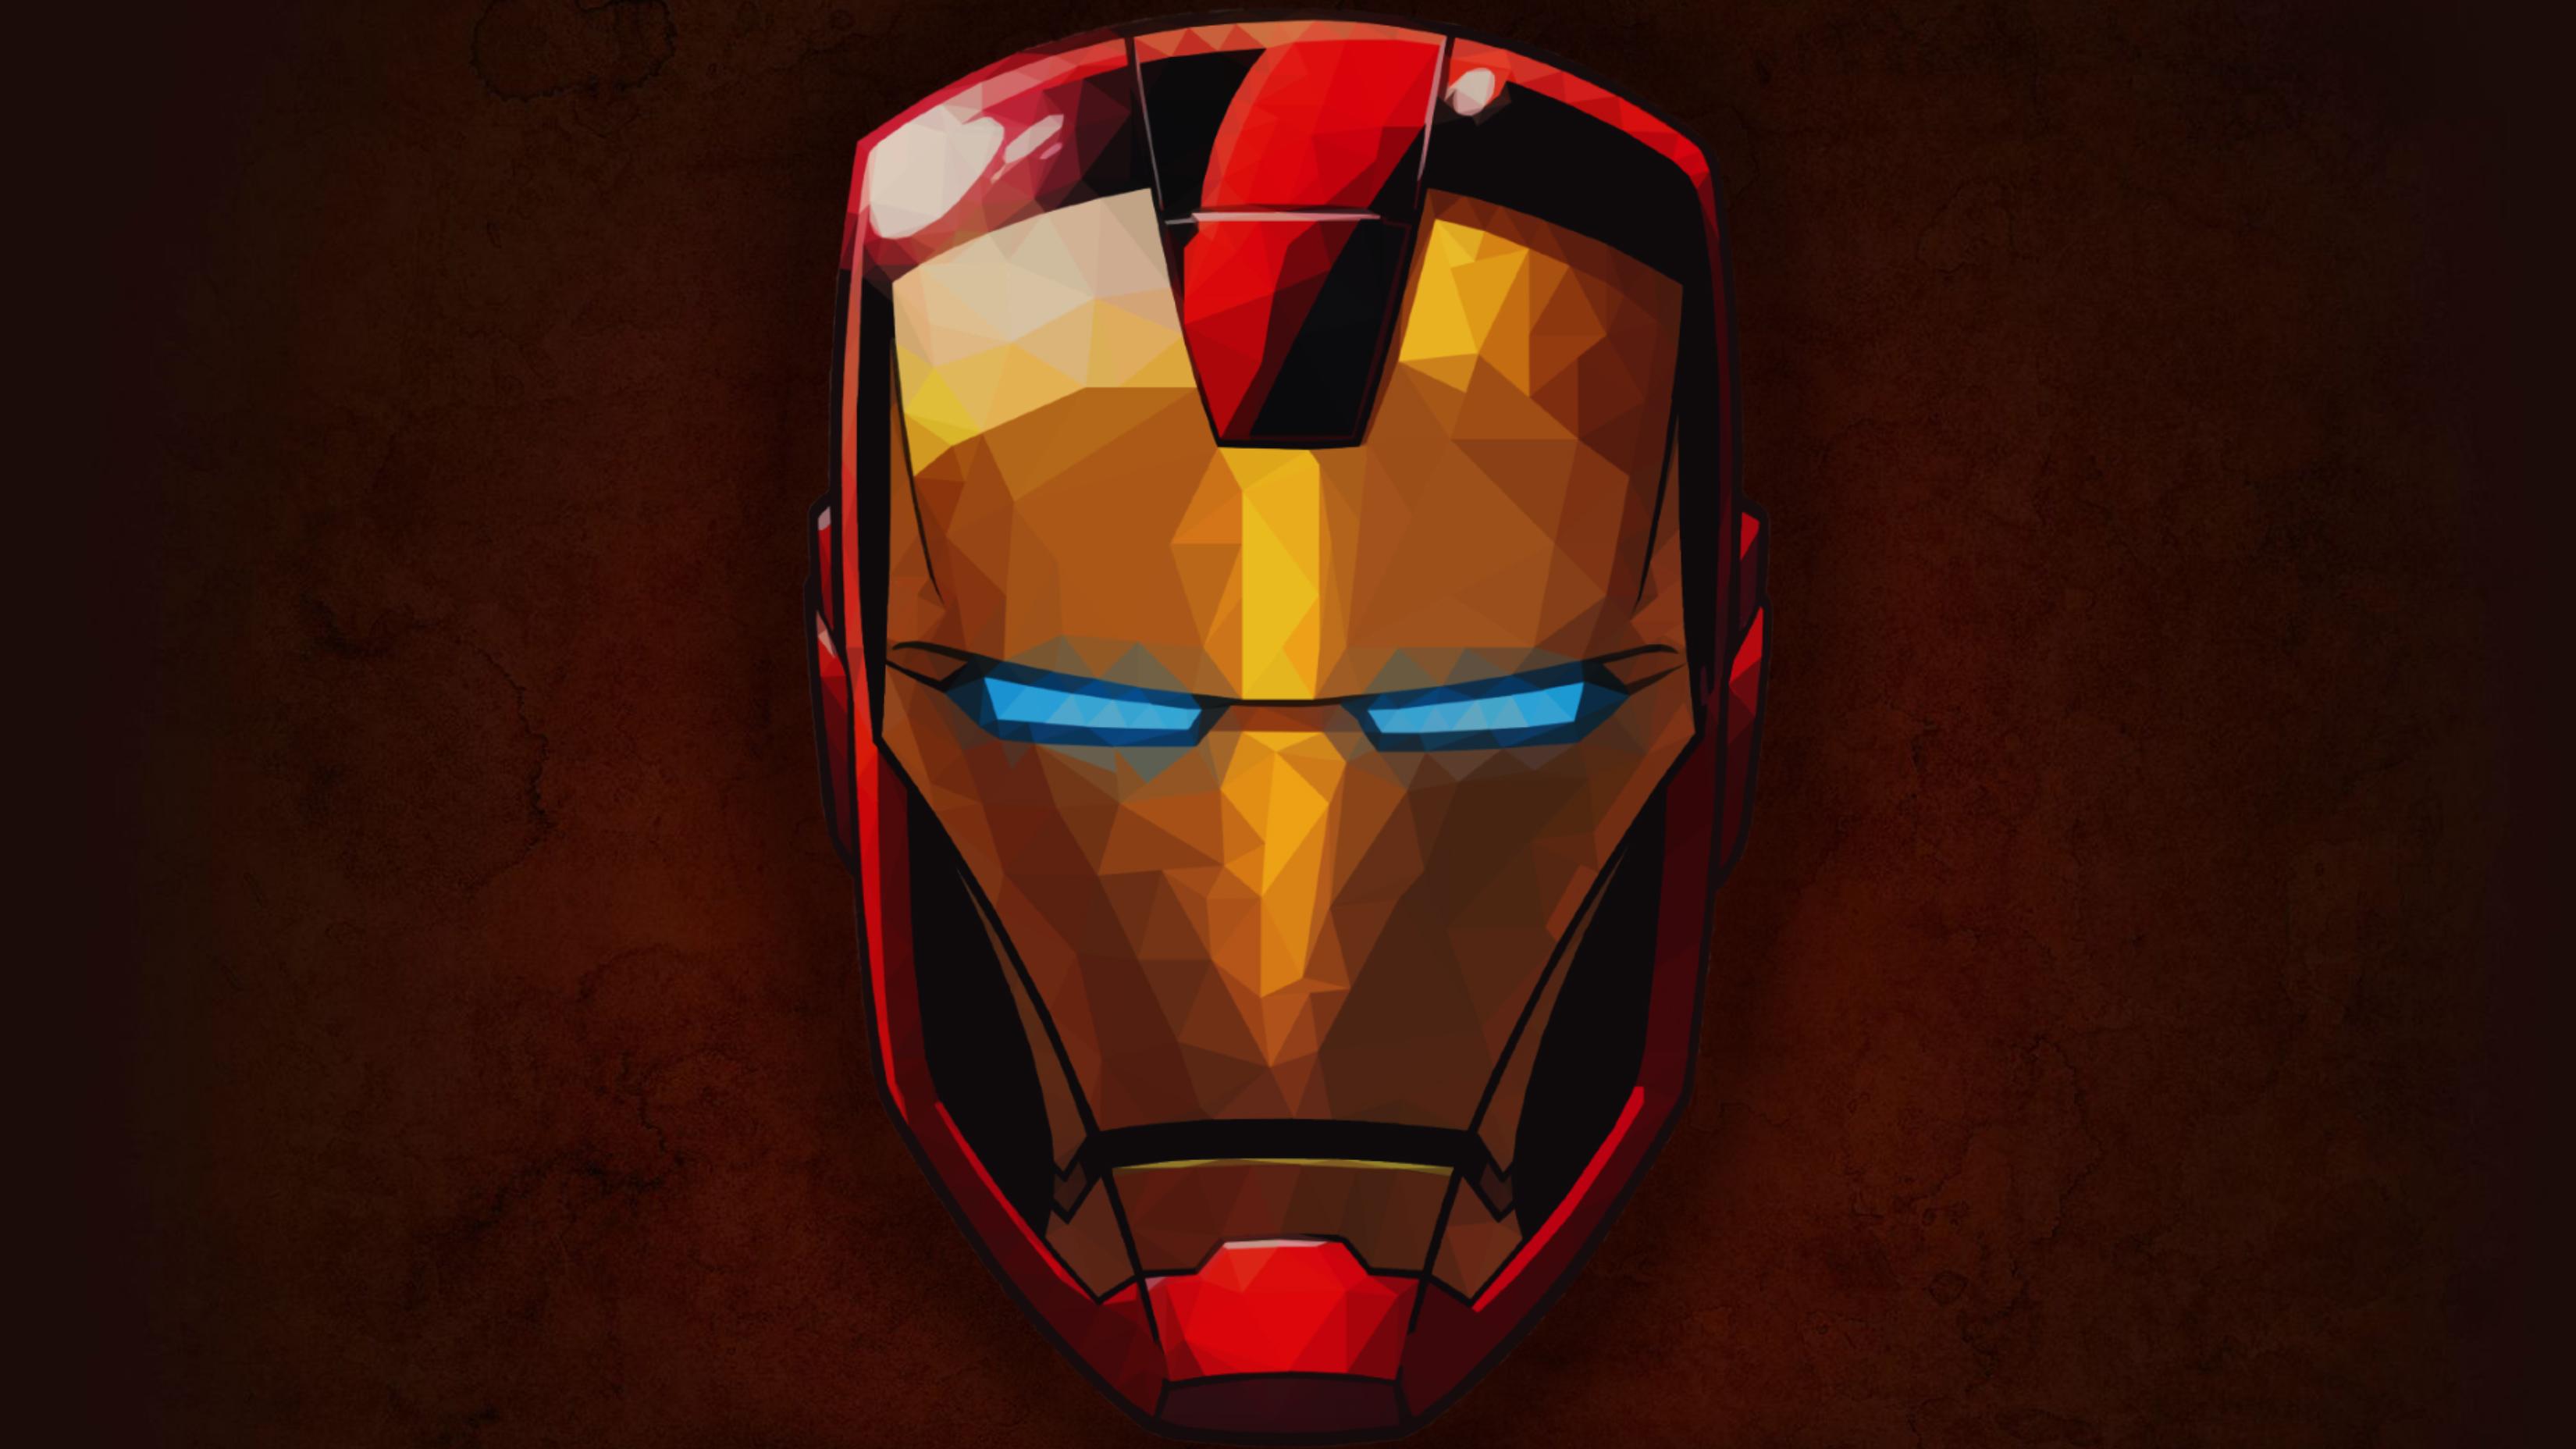 Iron Man Art Print Hd Superheroes 4k Wallpapers Images